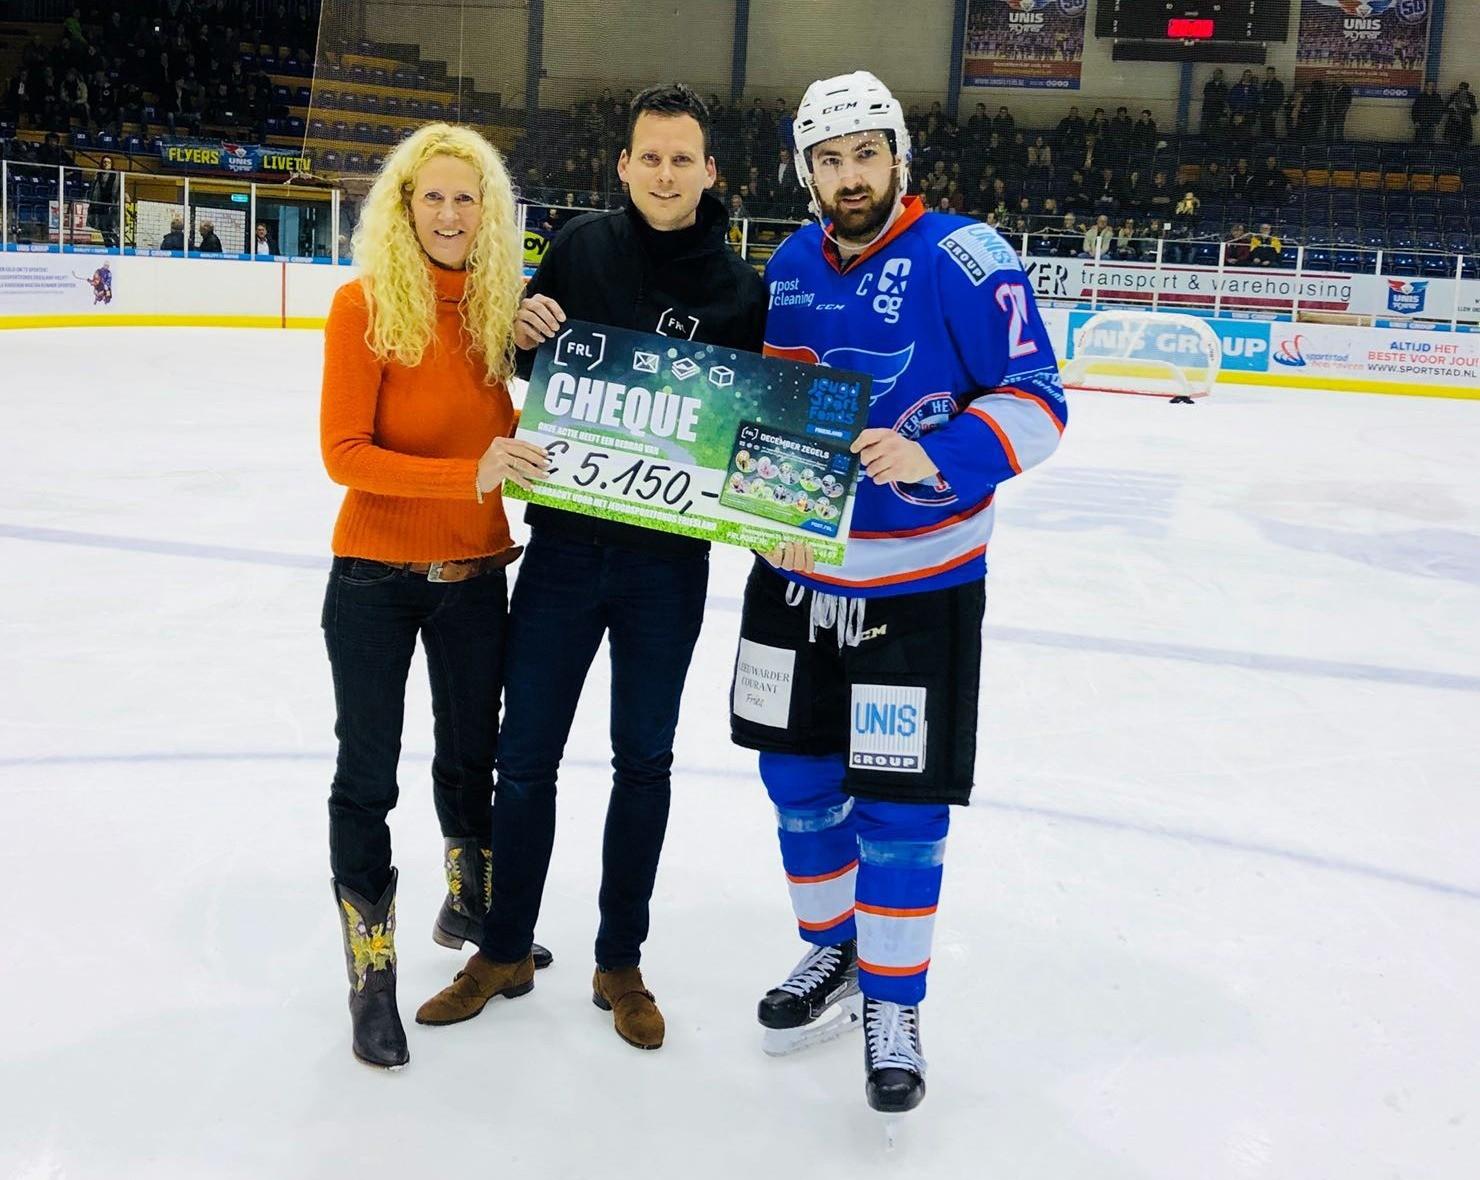 Ambassadeur Jeugdsportfonds Friesland Tony Demelinne neemt cheque in ontvangst.